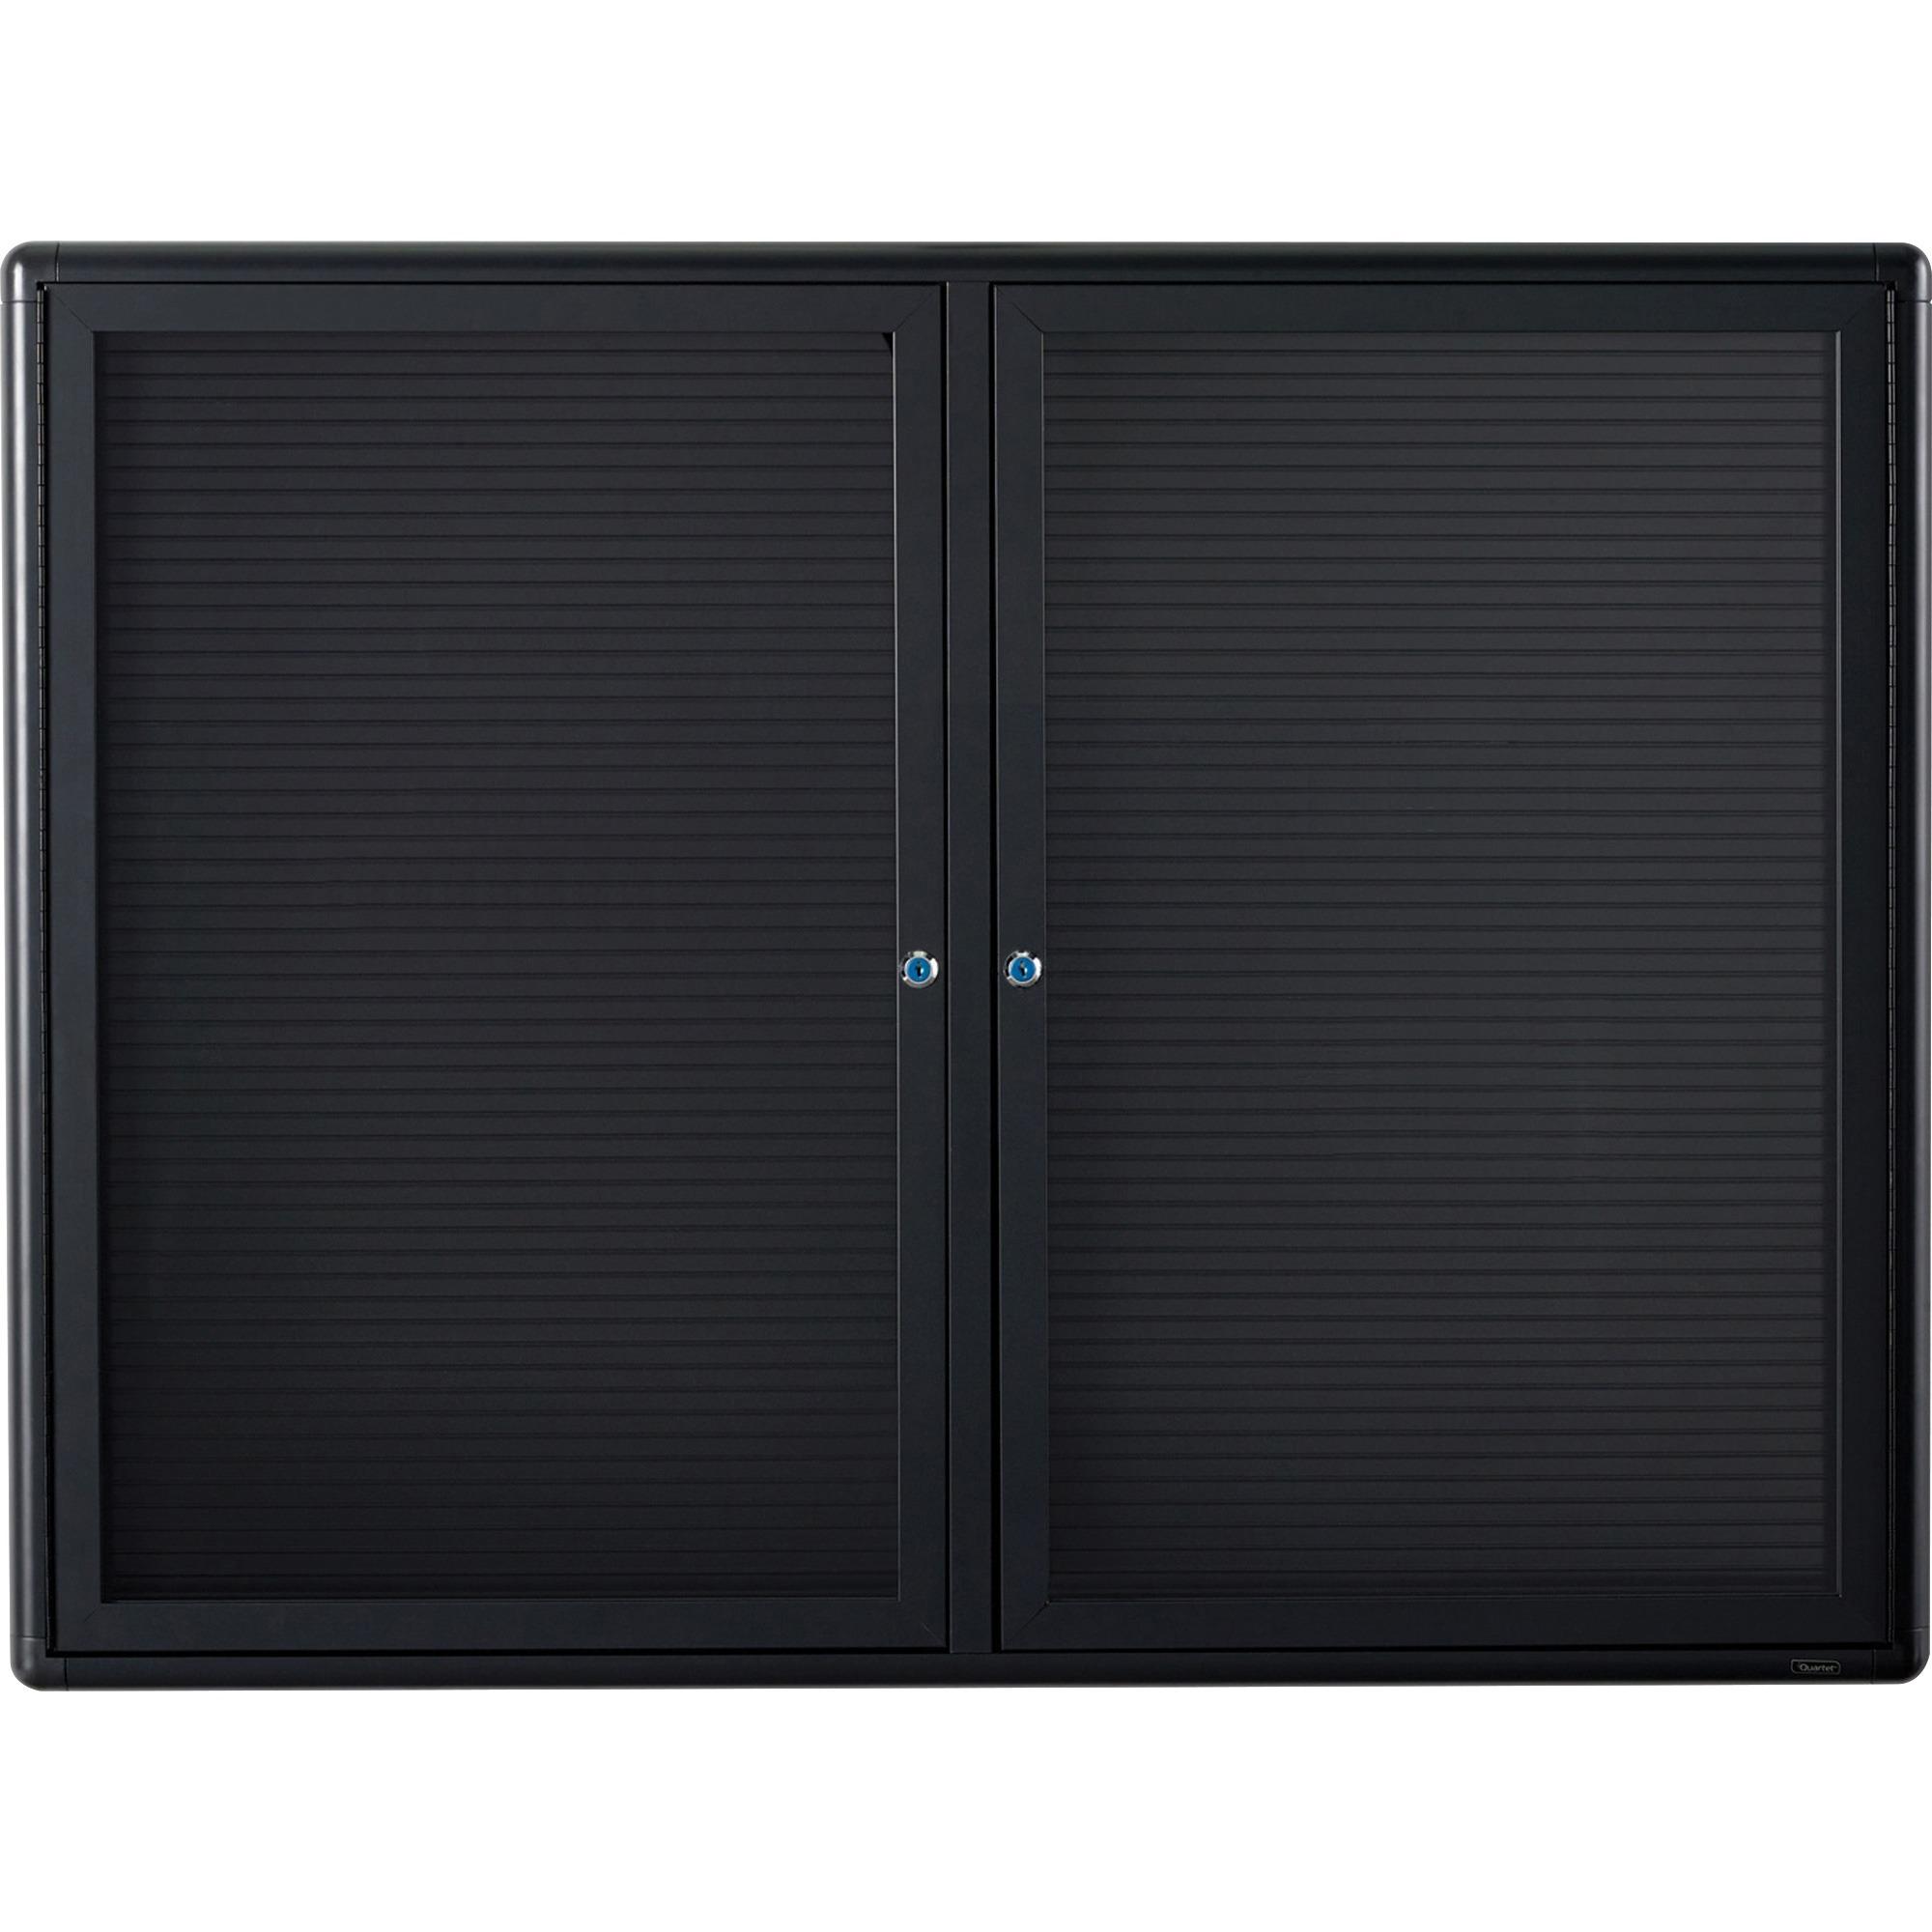 Acco Brands Corporation Quartet® Radius Design Changeable Letter Directory, 4 X 3, 2 Door, Graphite Frame - 36 Height X 48 Width - Black Surface - Graphite Frame - 1 / Each